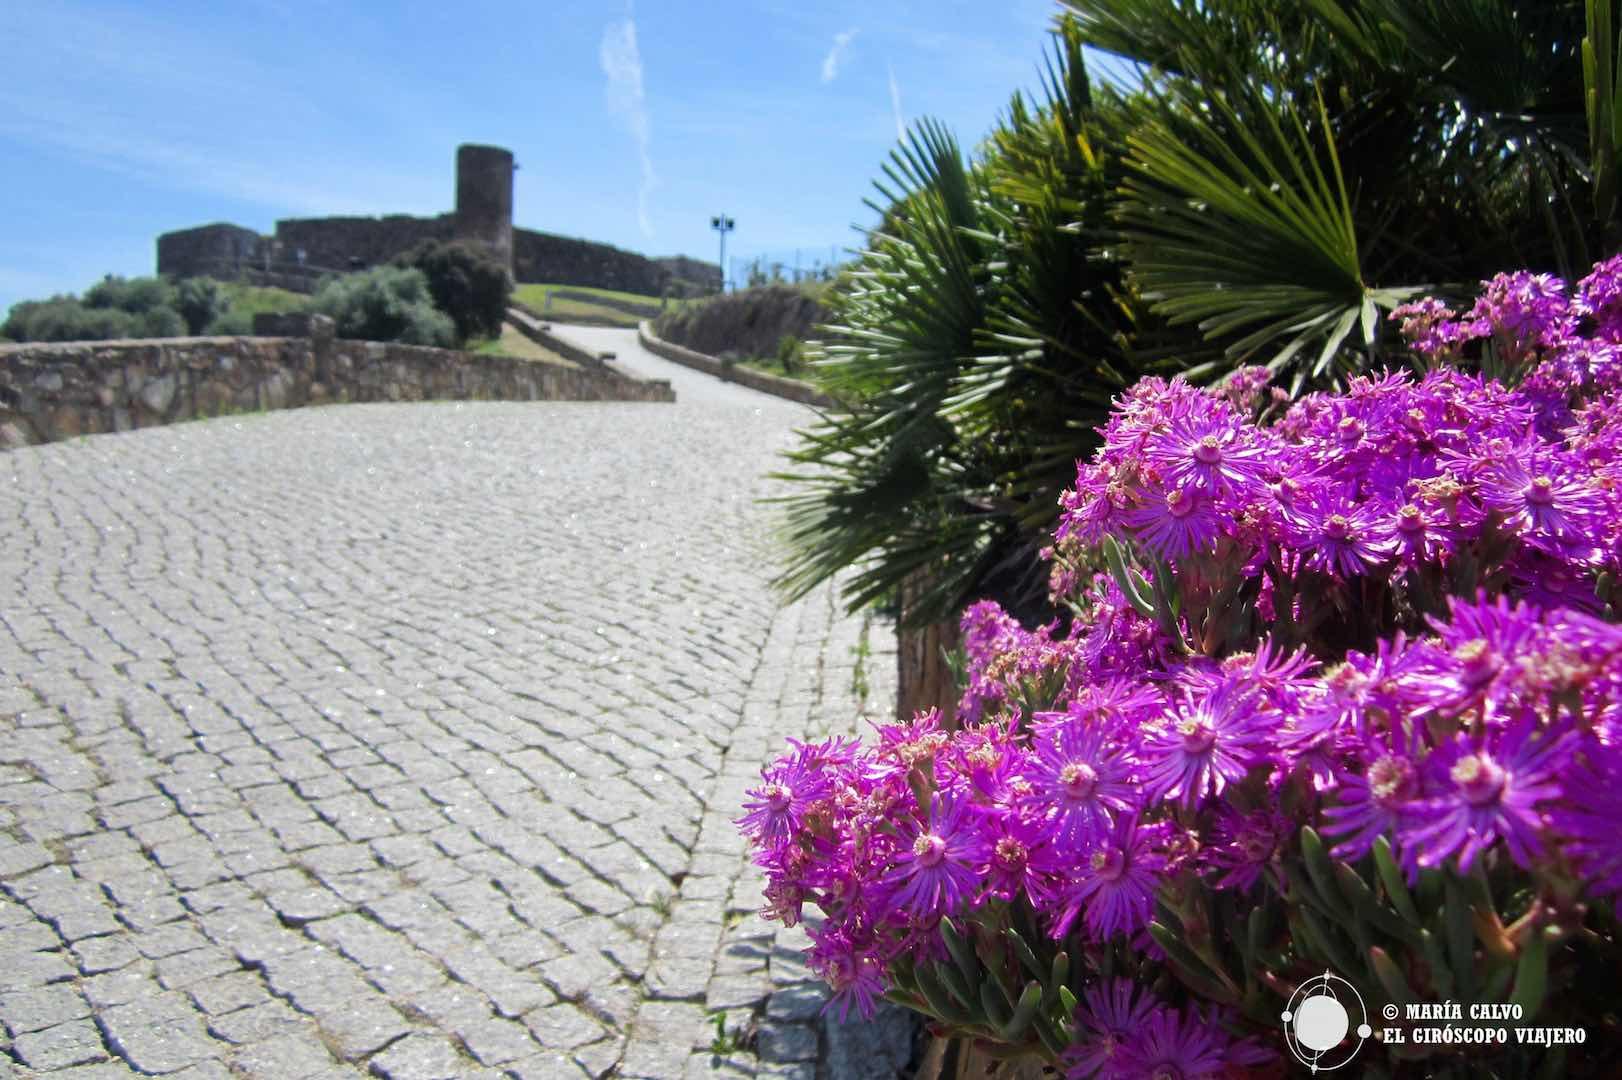 El castillo de Aljezur